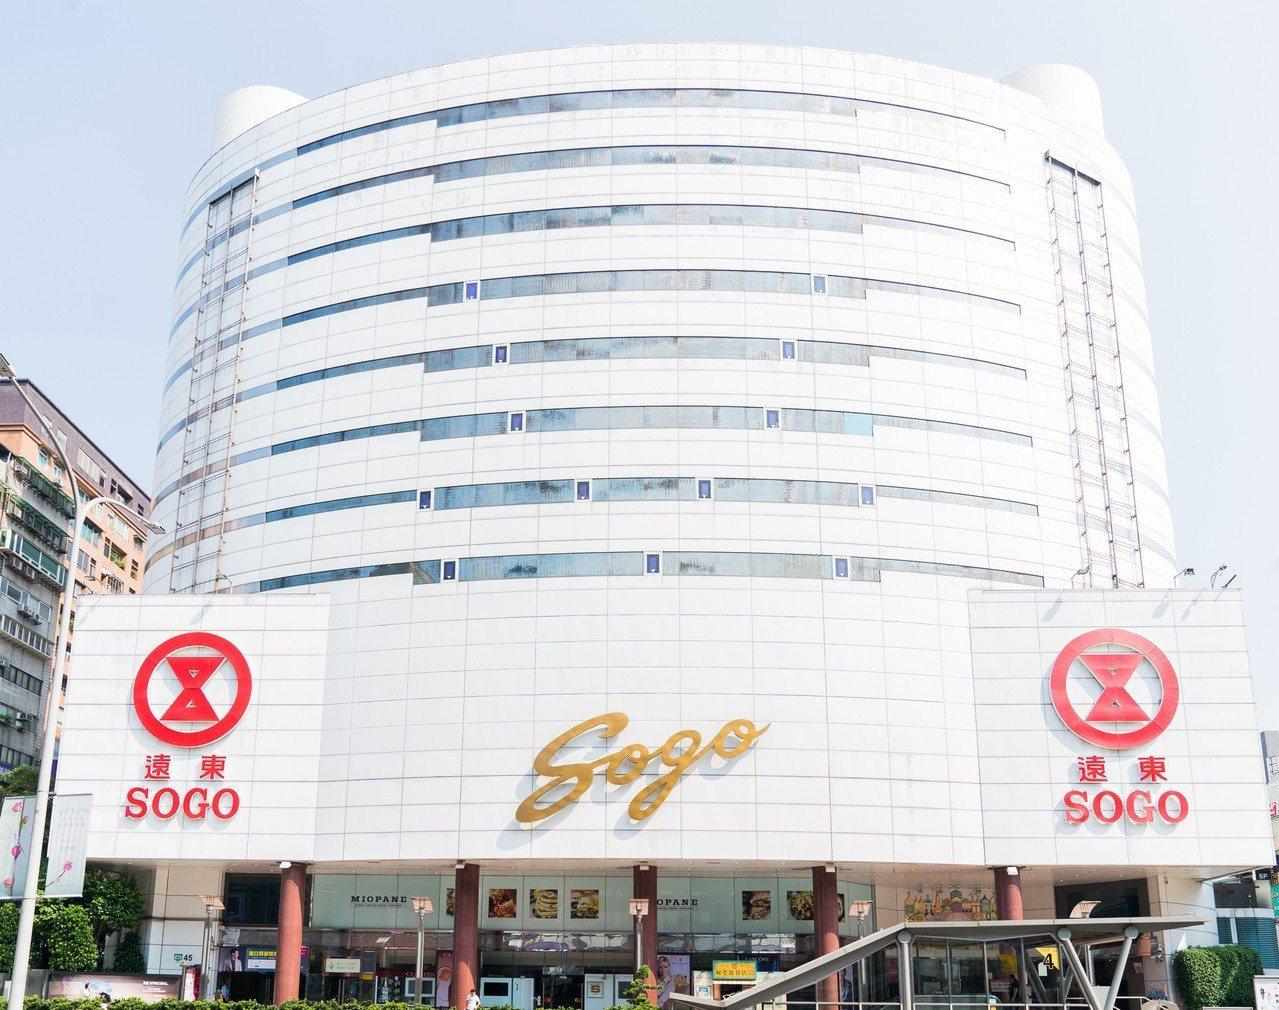 SOGO台北店母親節化妝品購物慶檔期4月3日起至4月29日開跑。圖/SOGO提供